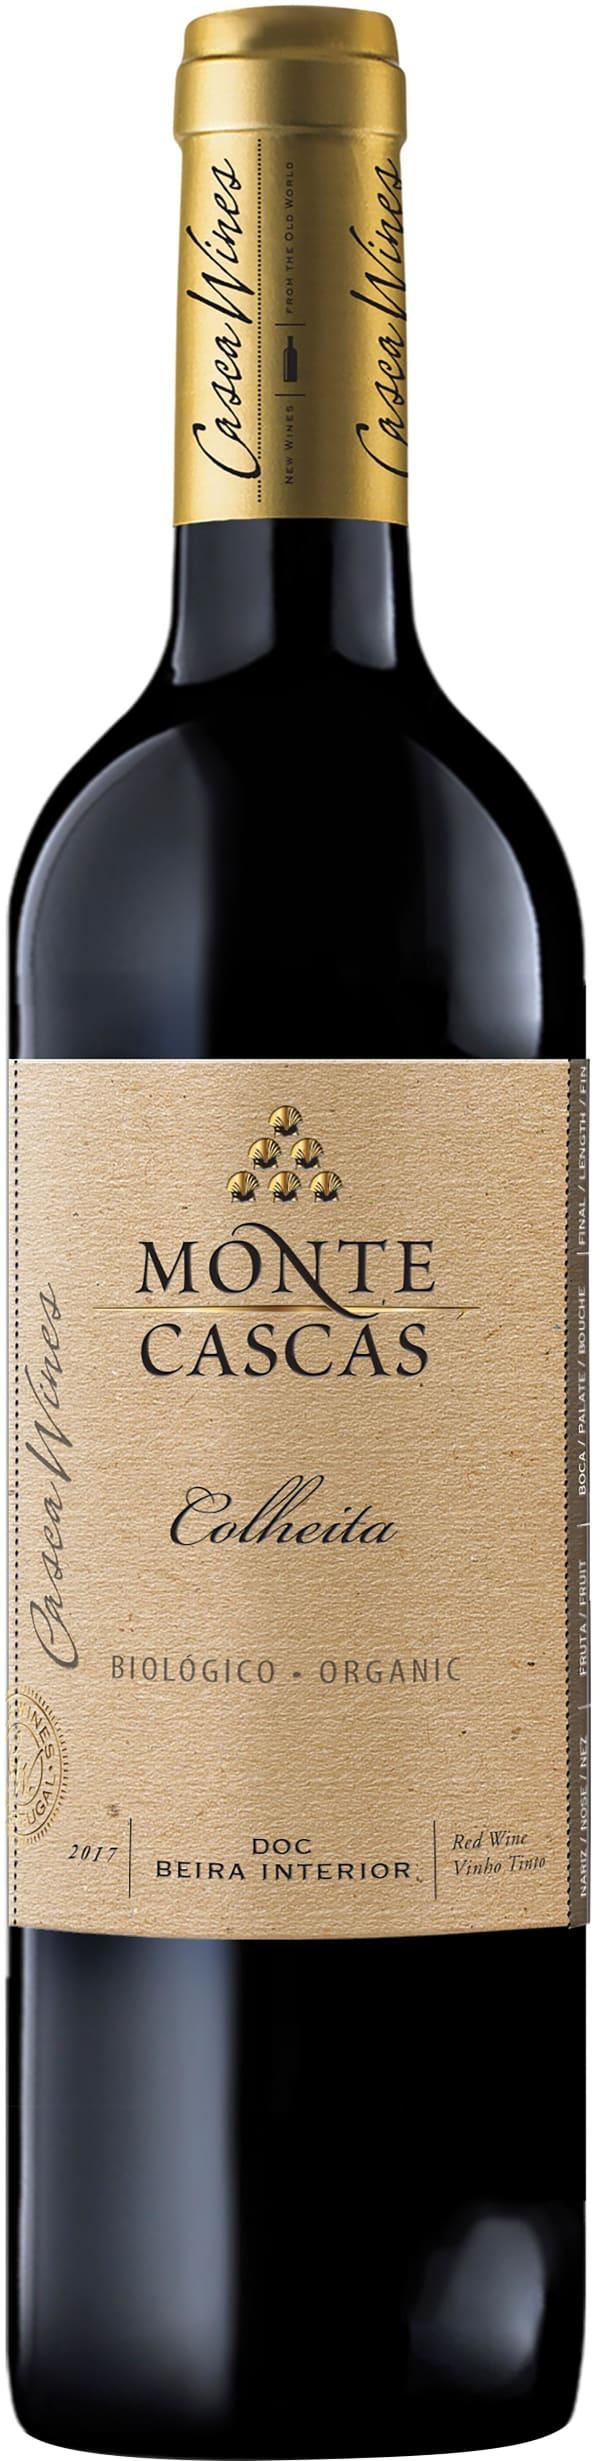 Monte Cascas Colheita Organic Tinto 2017